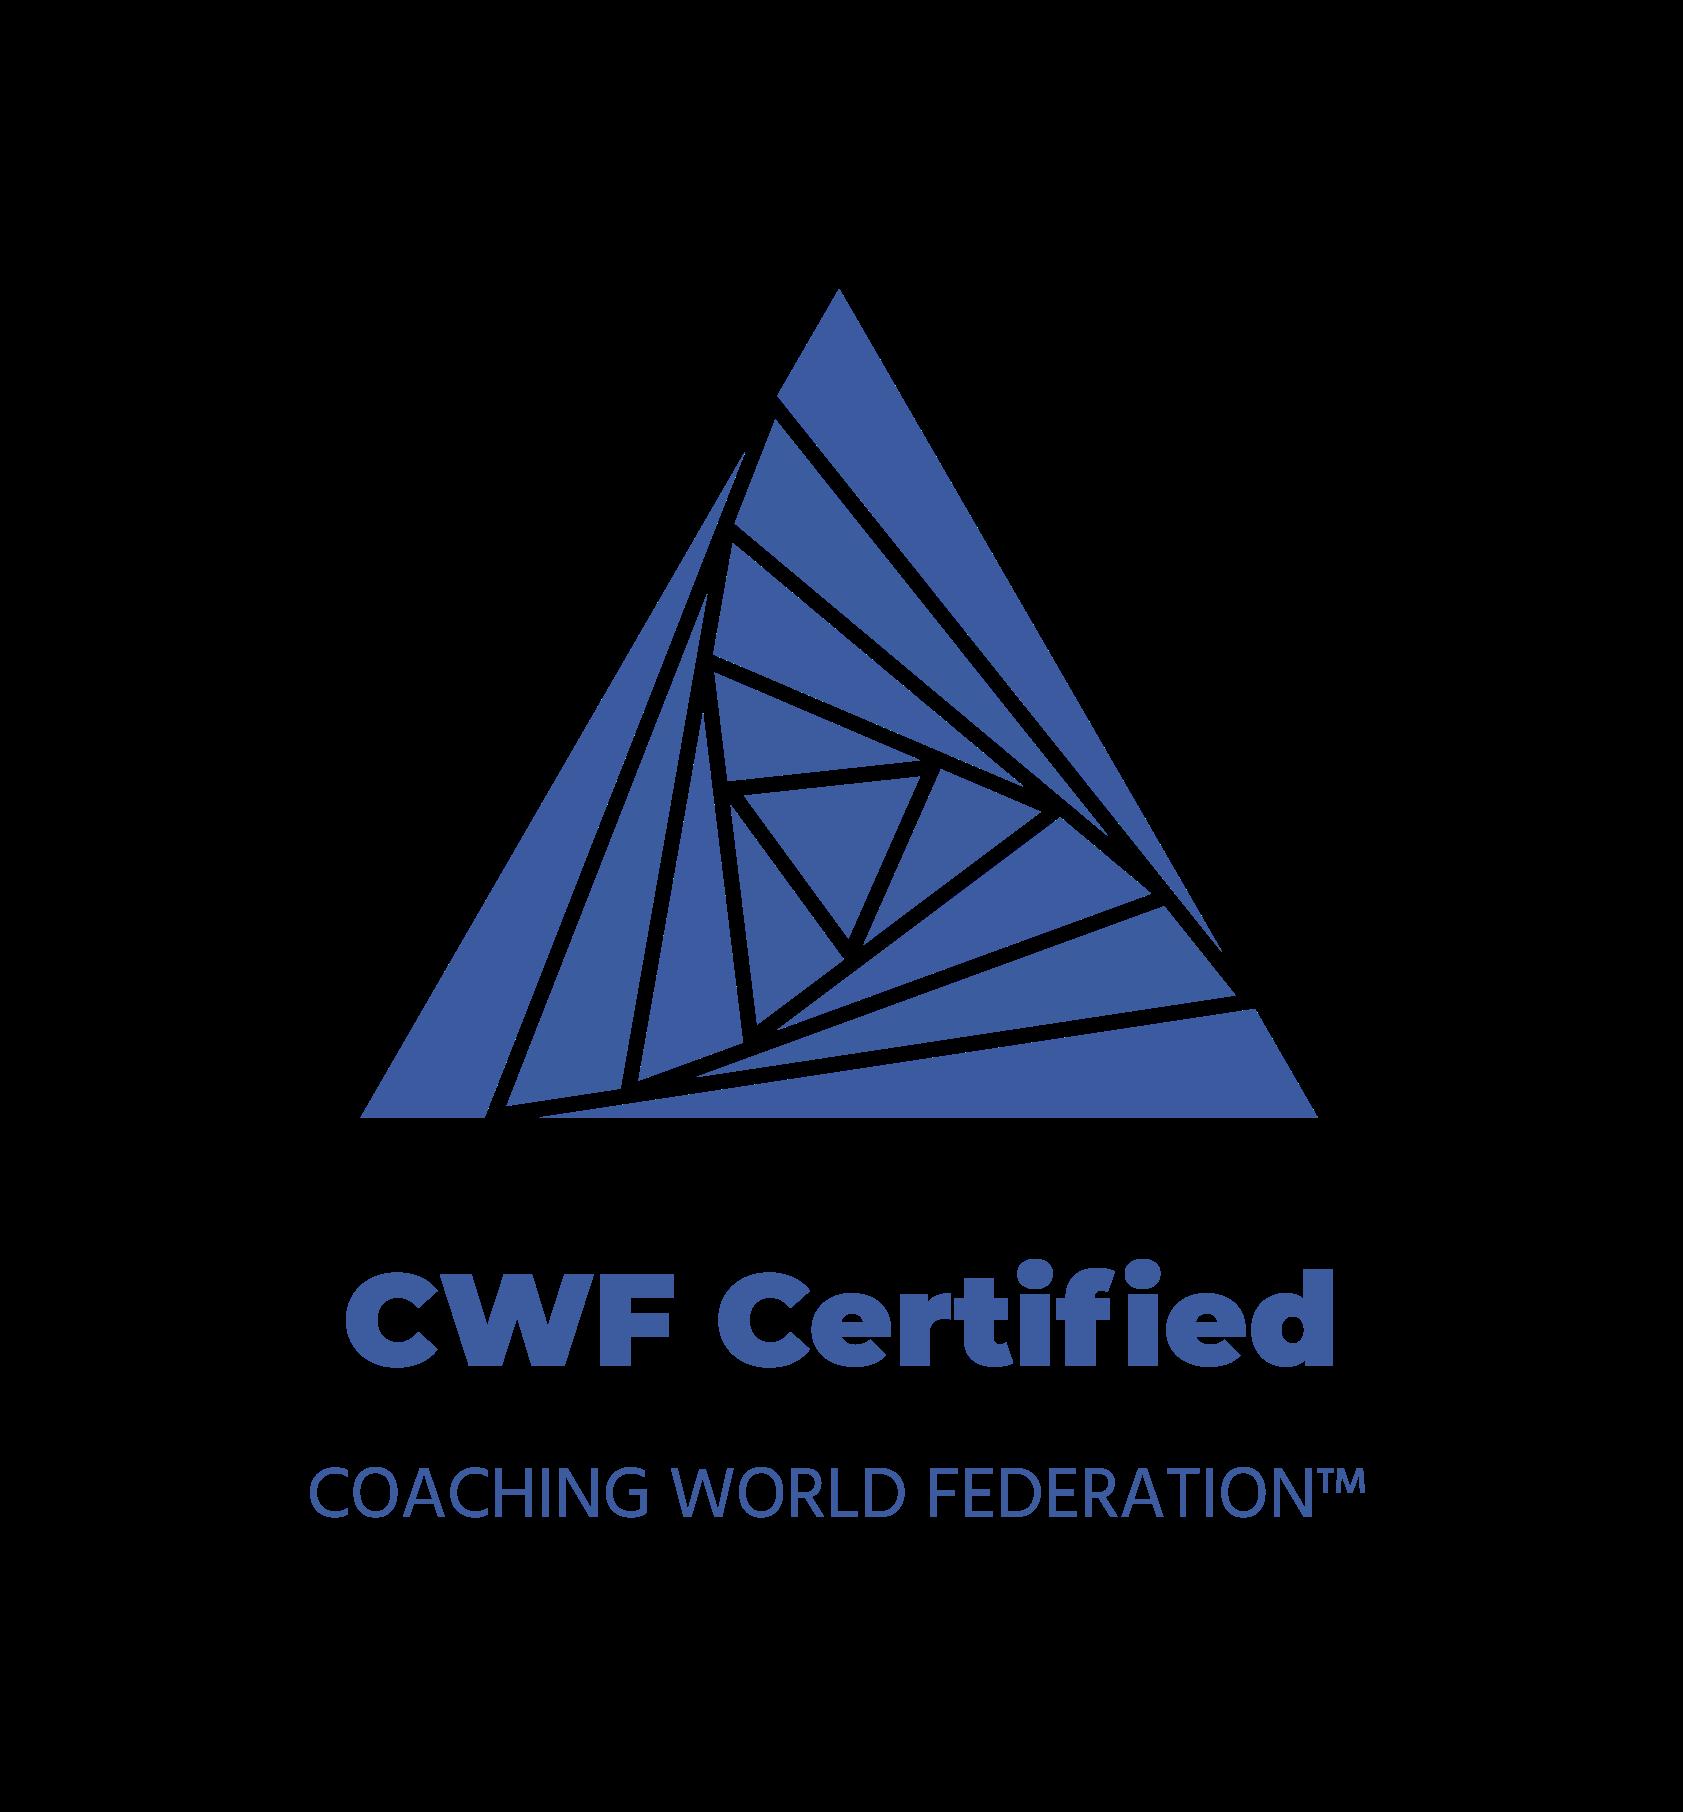 Coaching World Federation